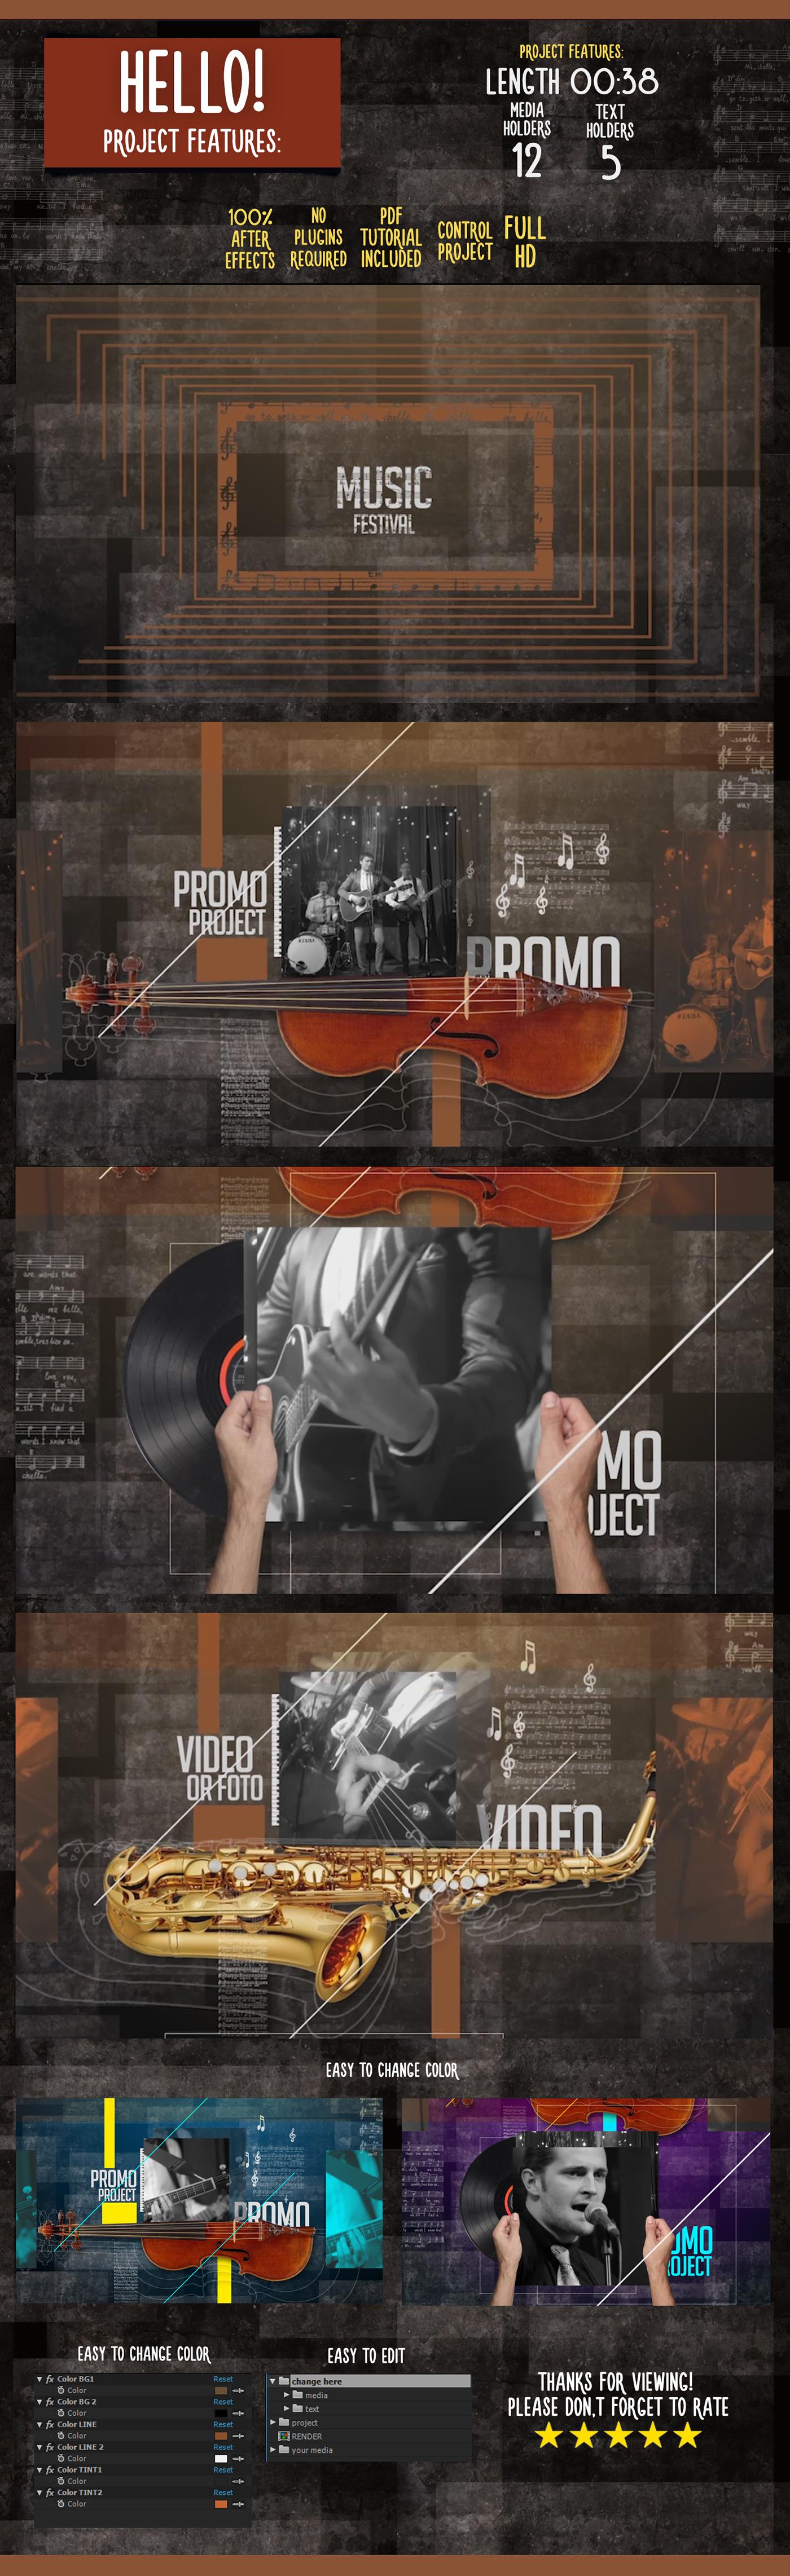 Music Fest Promo (Commercials)